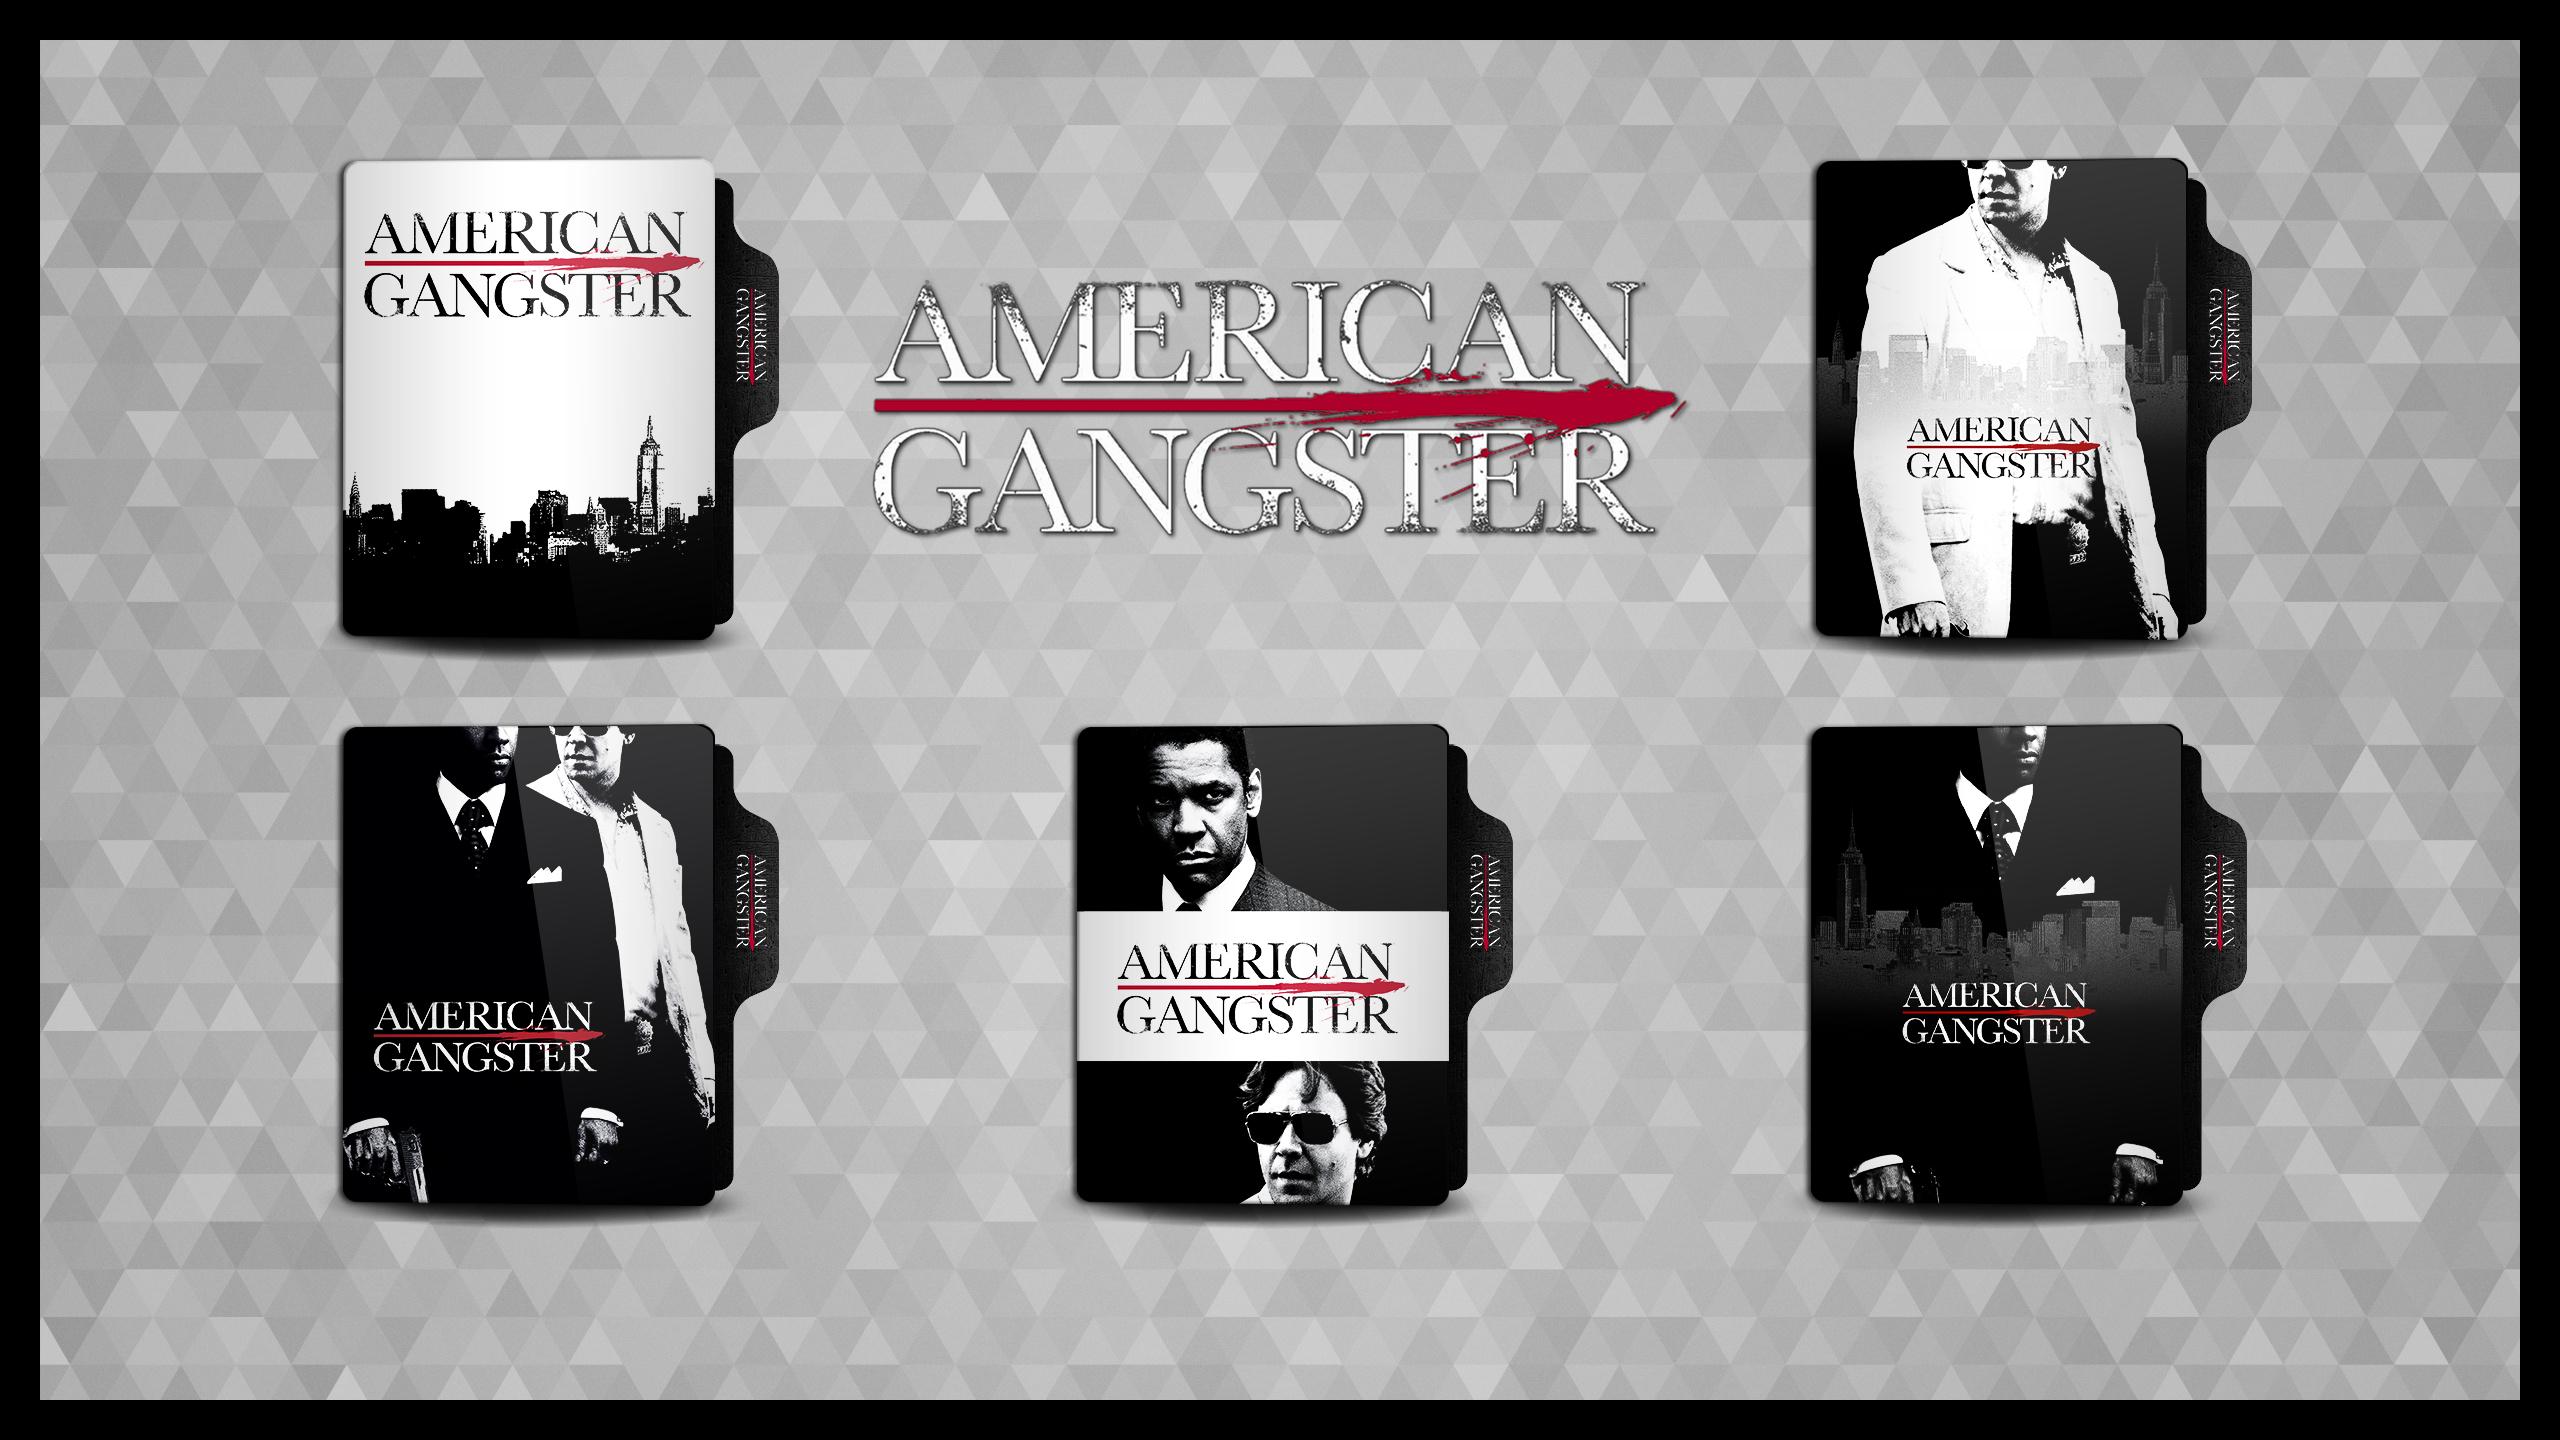 American Gangster 2007 Folder Icon By Mena7 On Deviantart